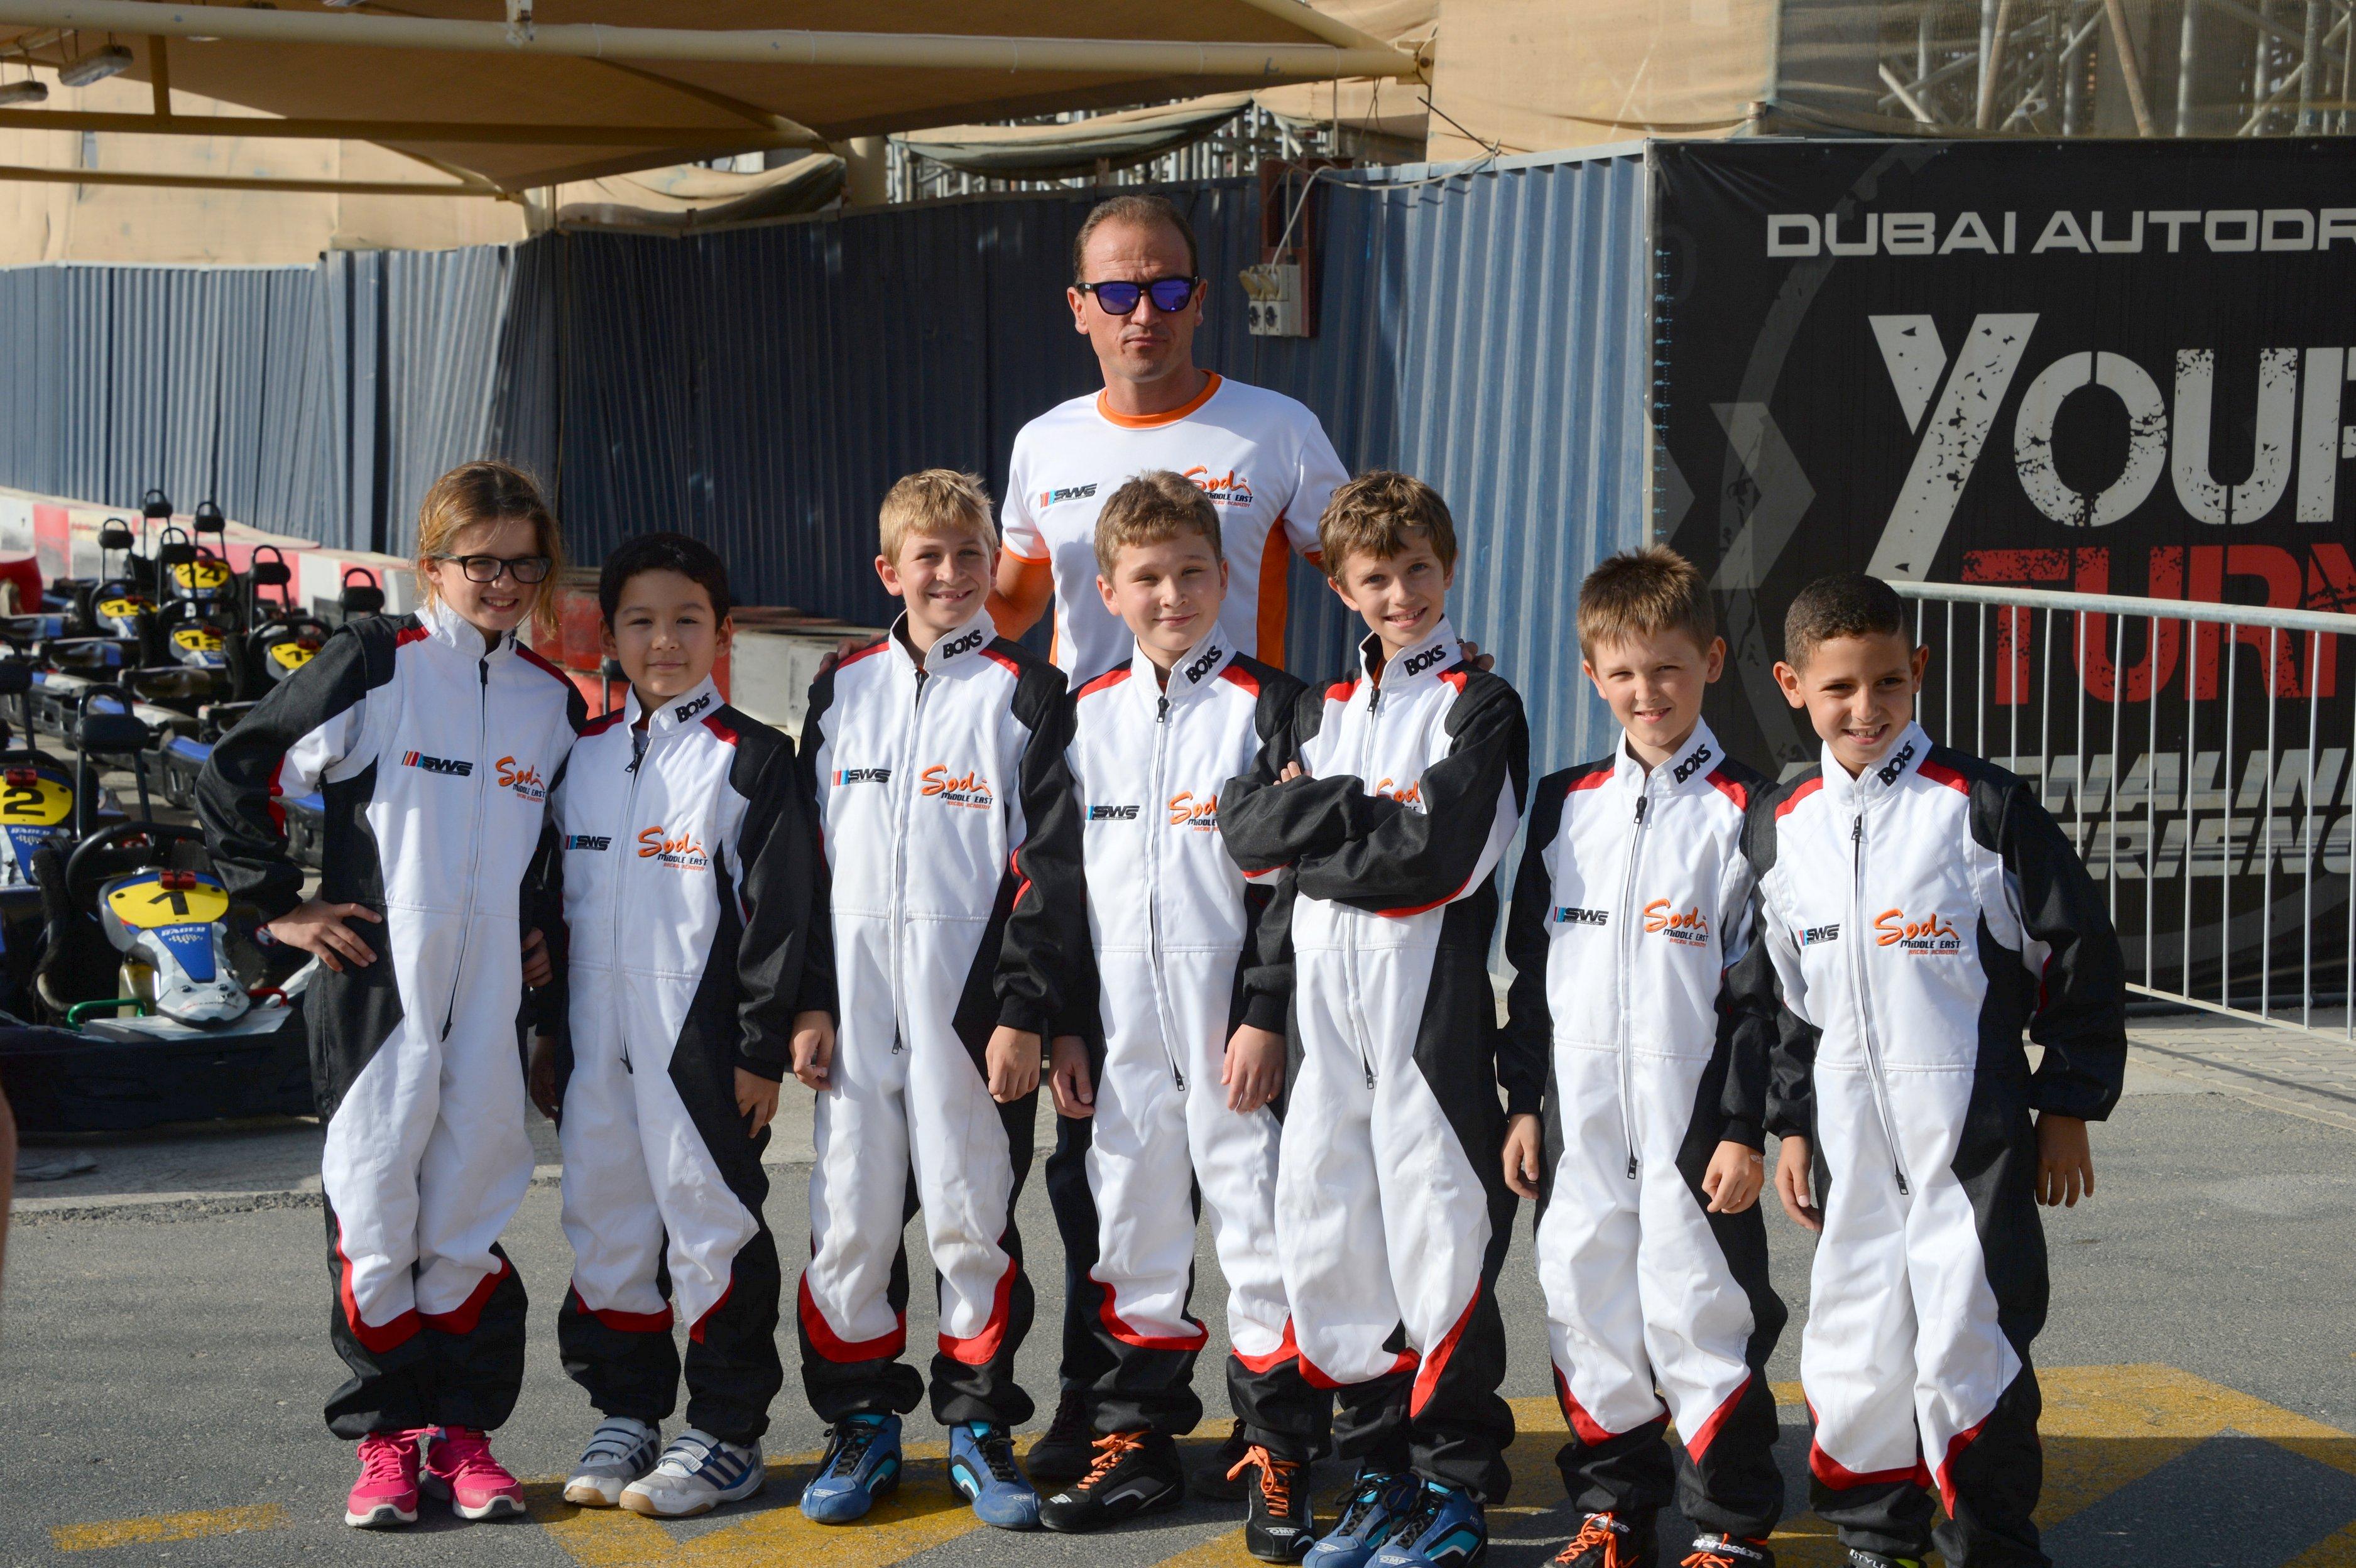 Dubai: Sodi Karting Racing Academy offers link to Rotax Micro series from SWS karts